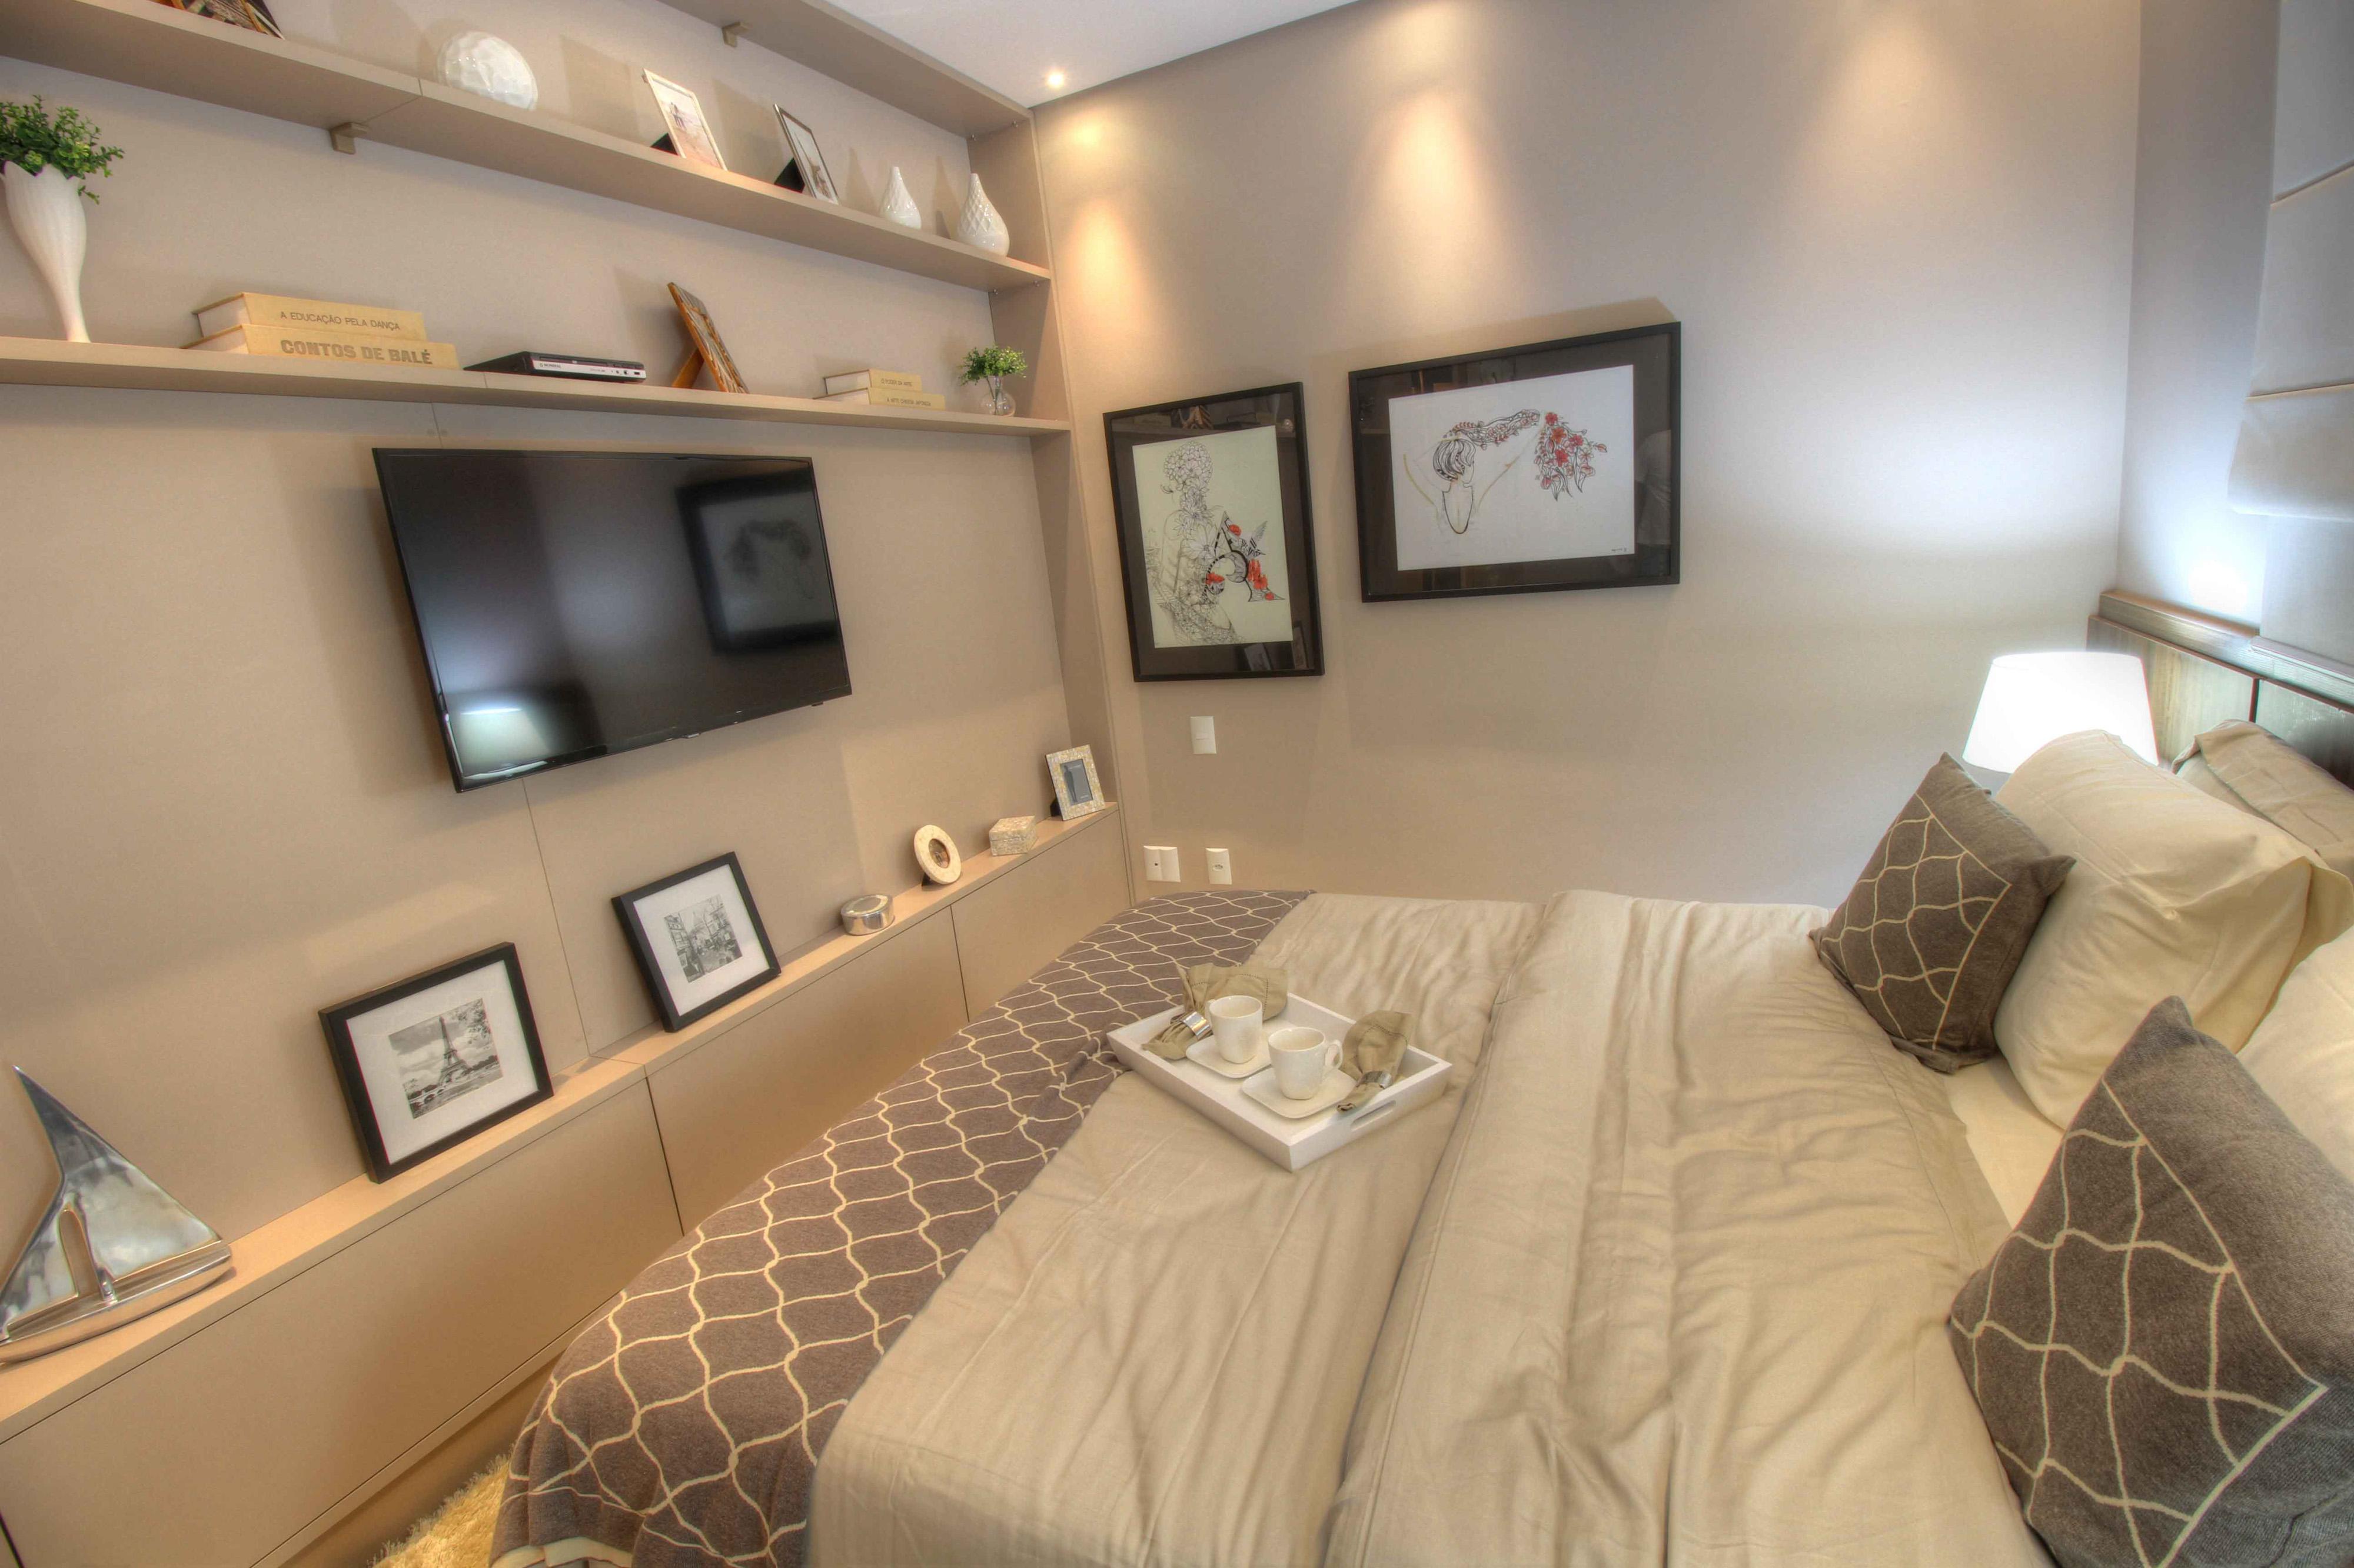 133 m² - Suíte do casal